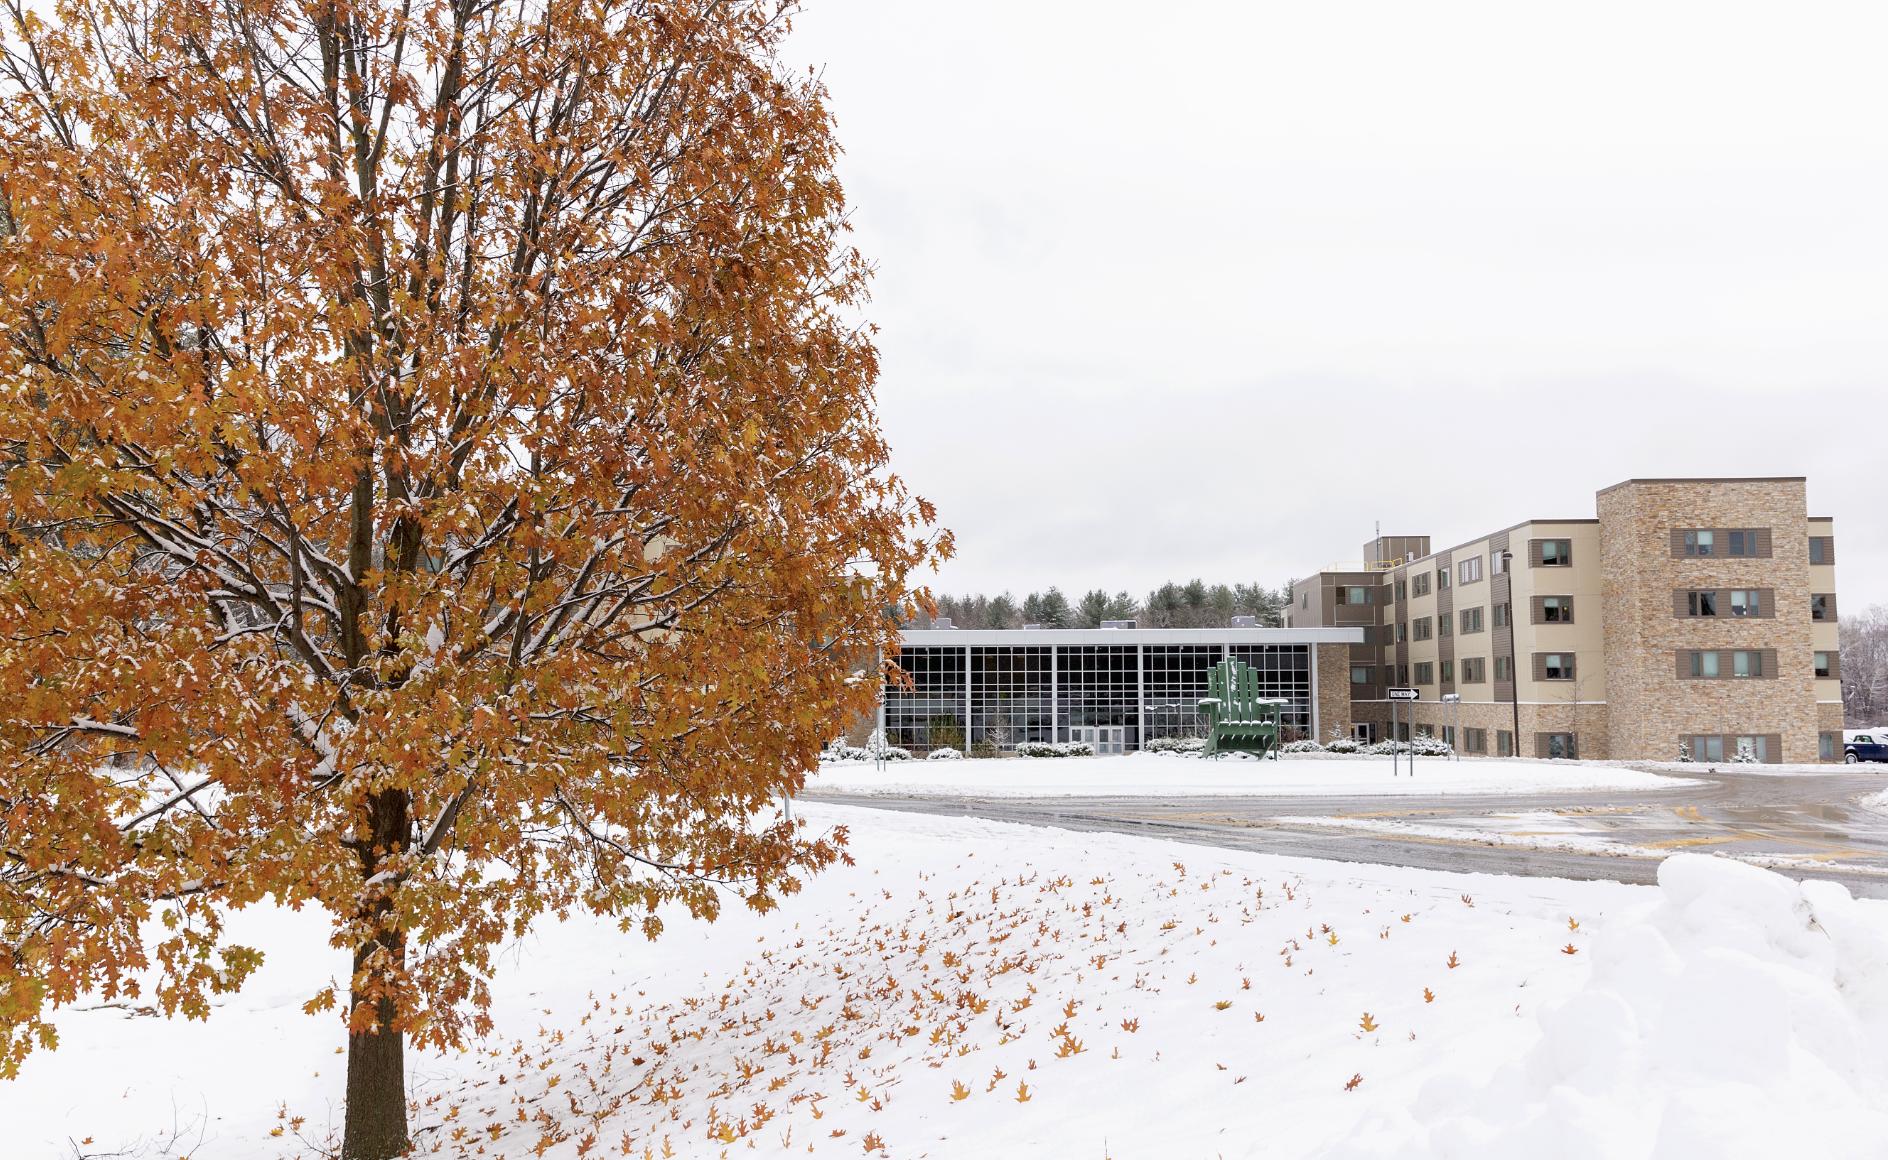 Winter scene on campus